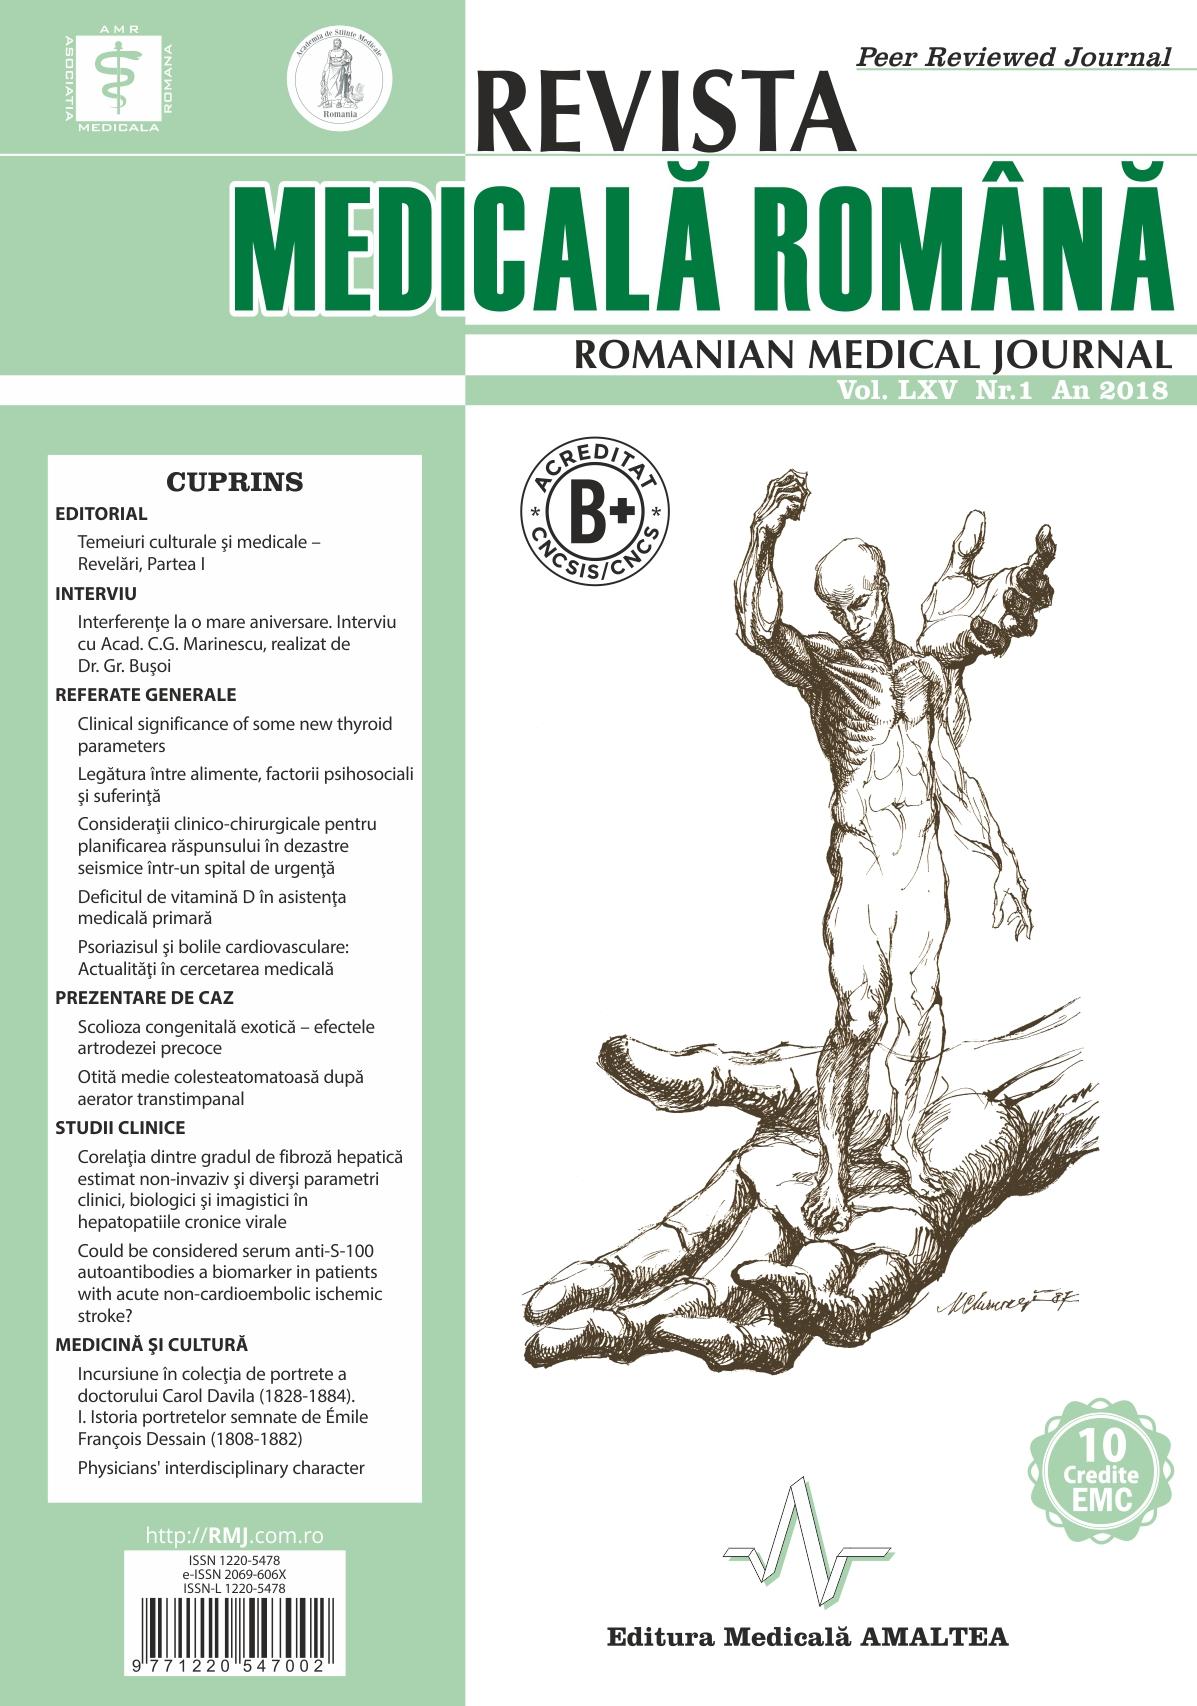 REVISTA MEDICALA ROMANA - Romanian Medical Journal, Vol. LXV, Nr. 1, An 2018